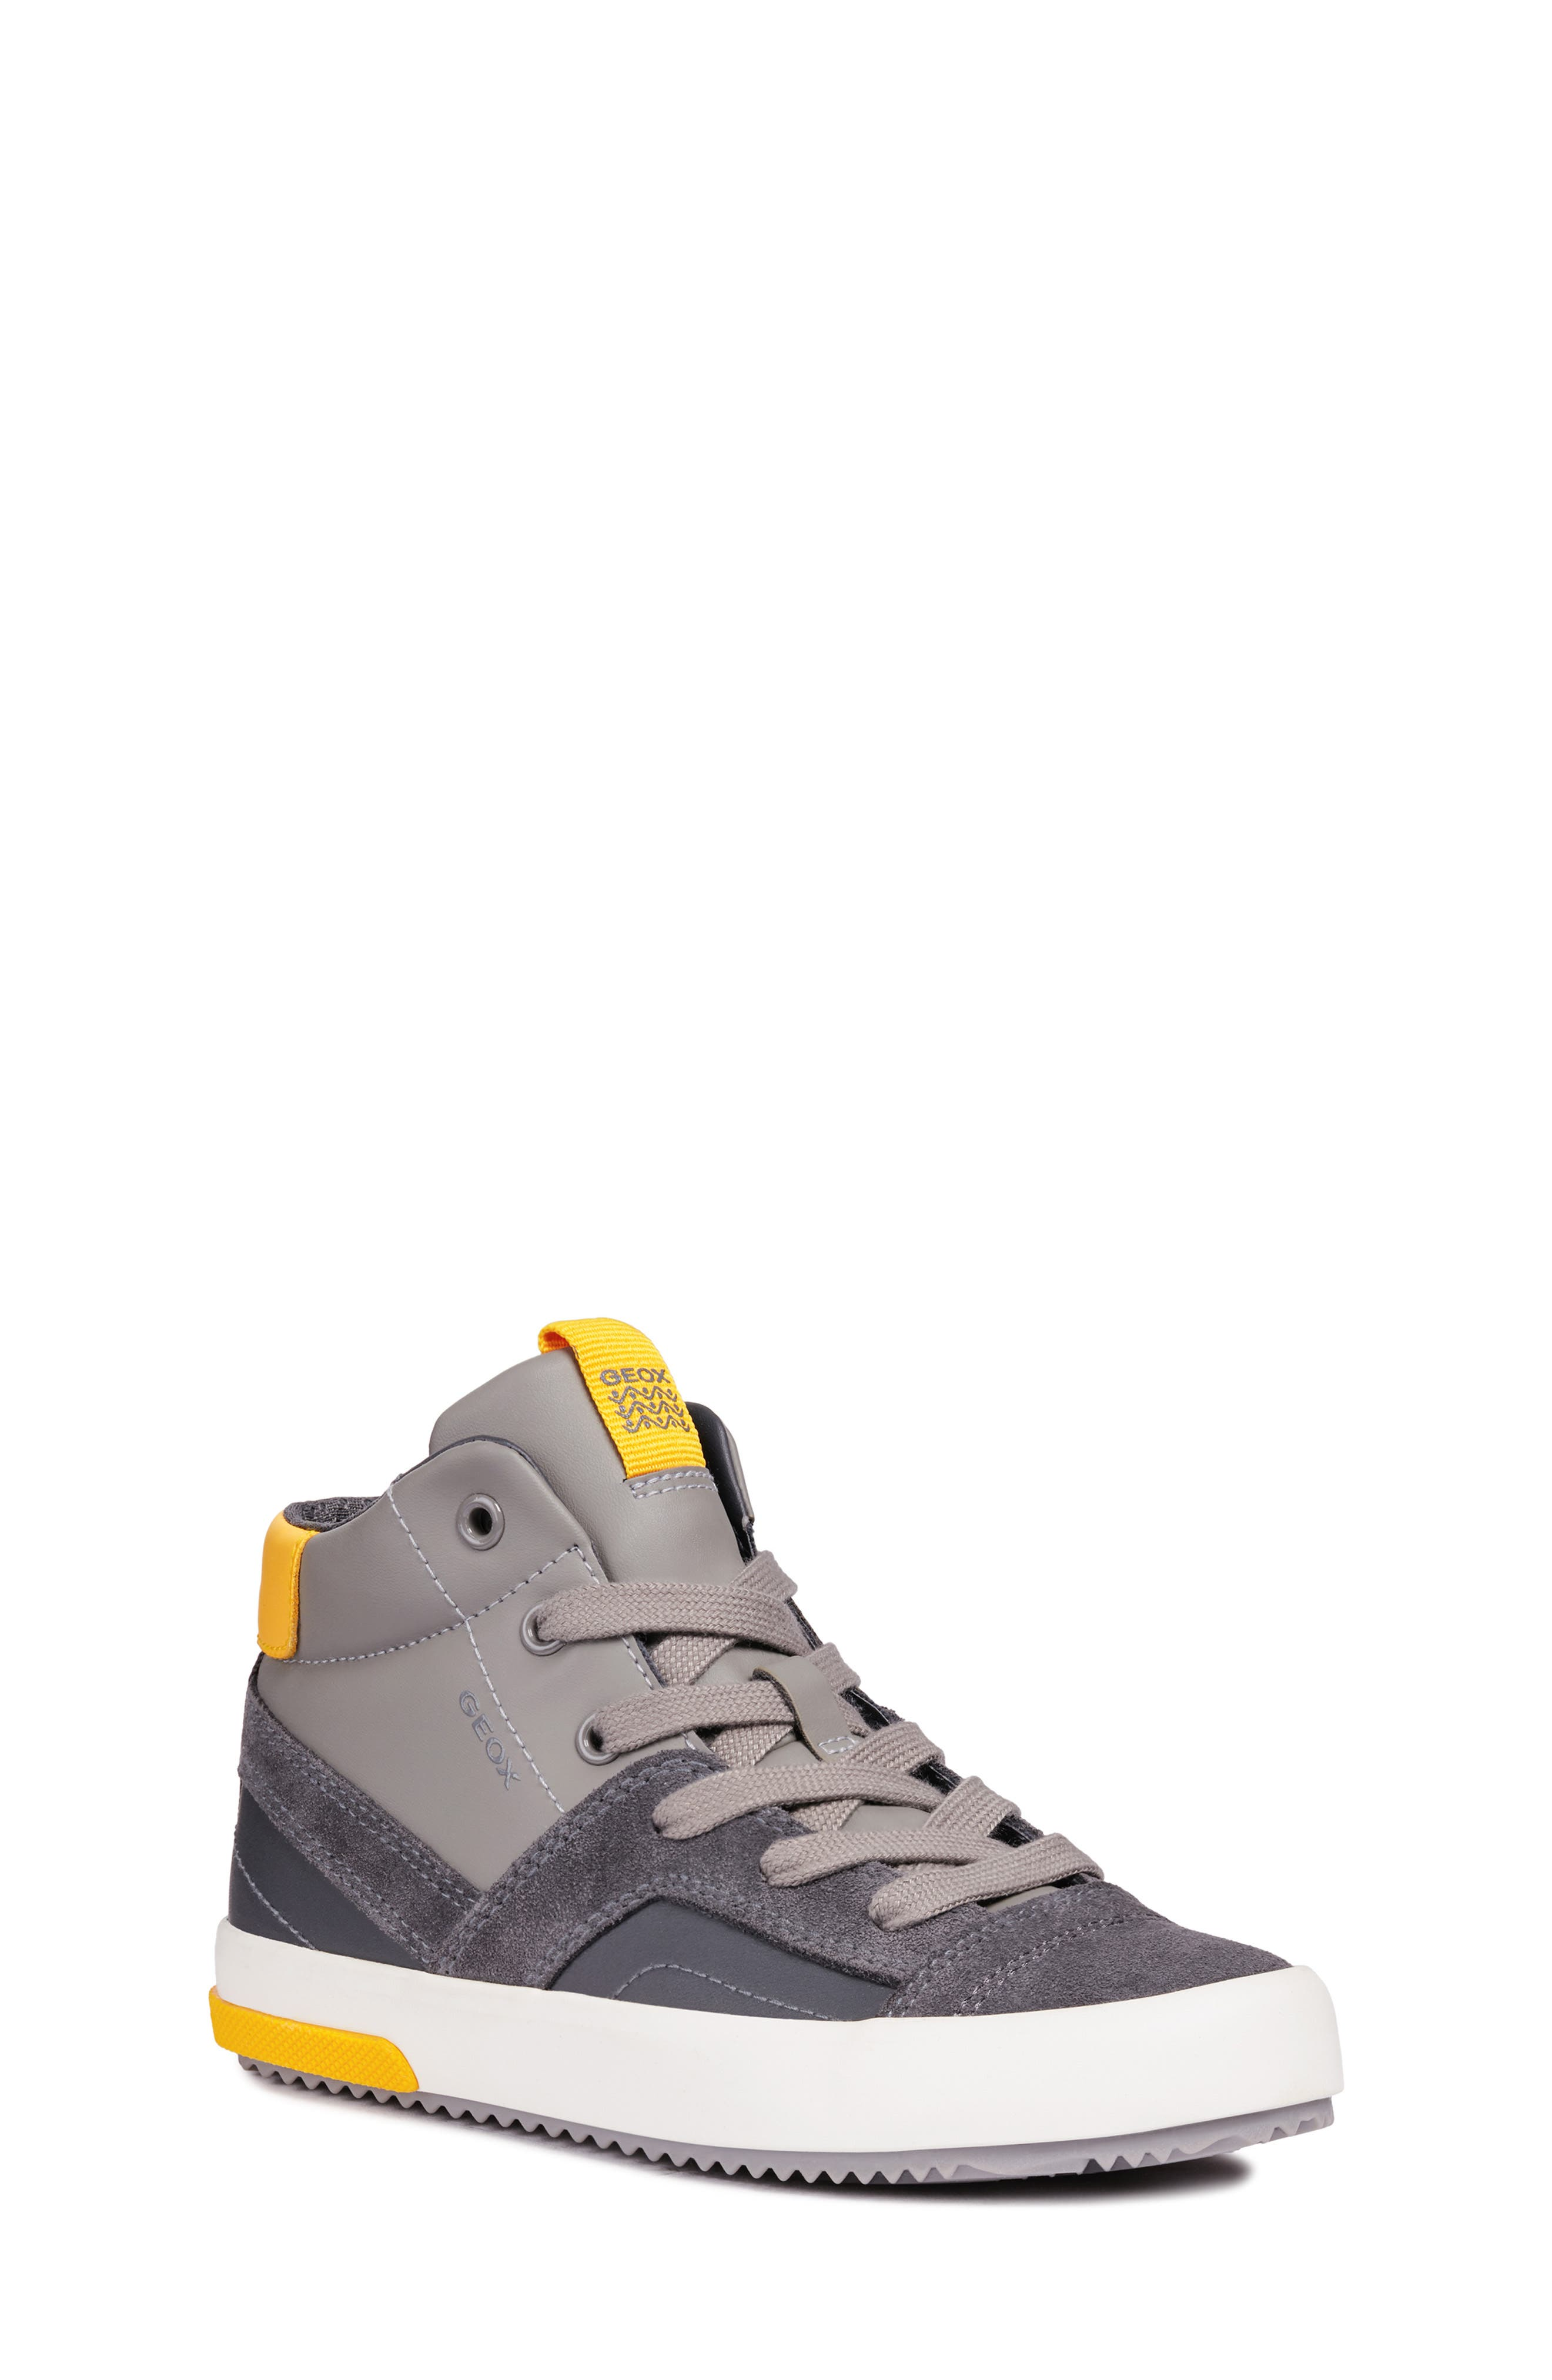 Alonisso 24 High Top Sneaker,                             Main thumbnail 1, color,                             DARK GREY/YELLOW